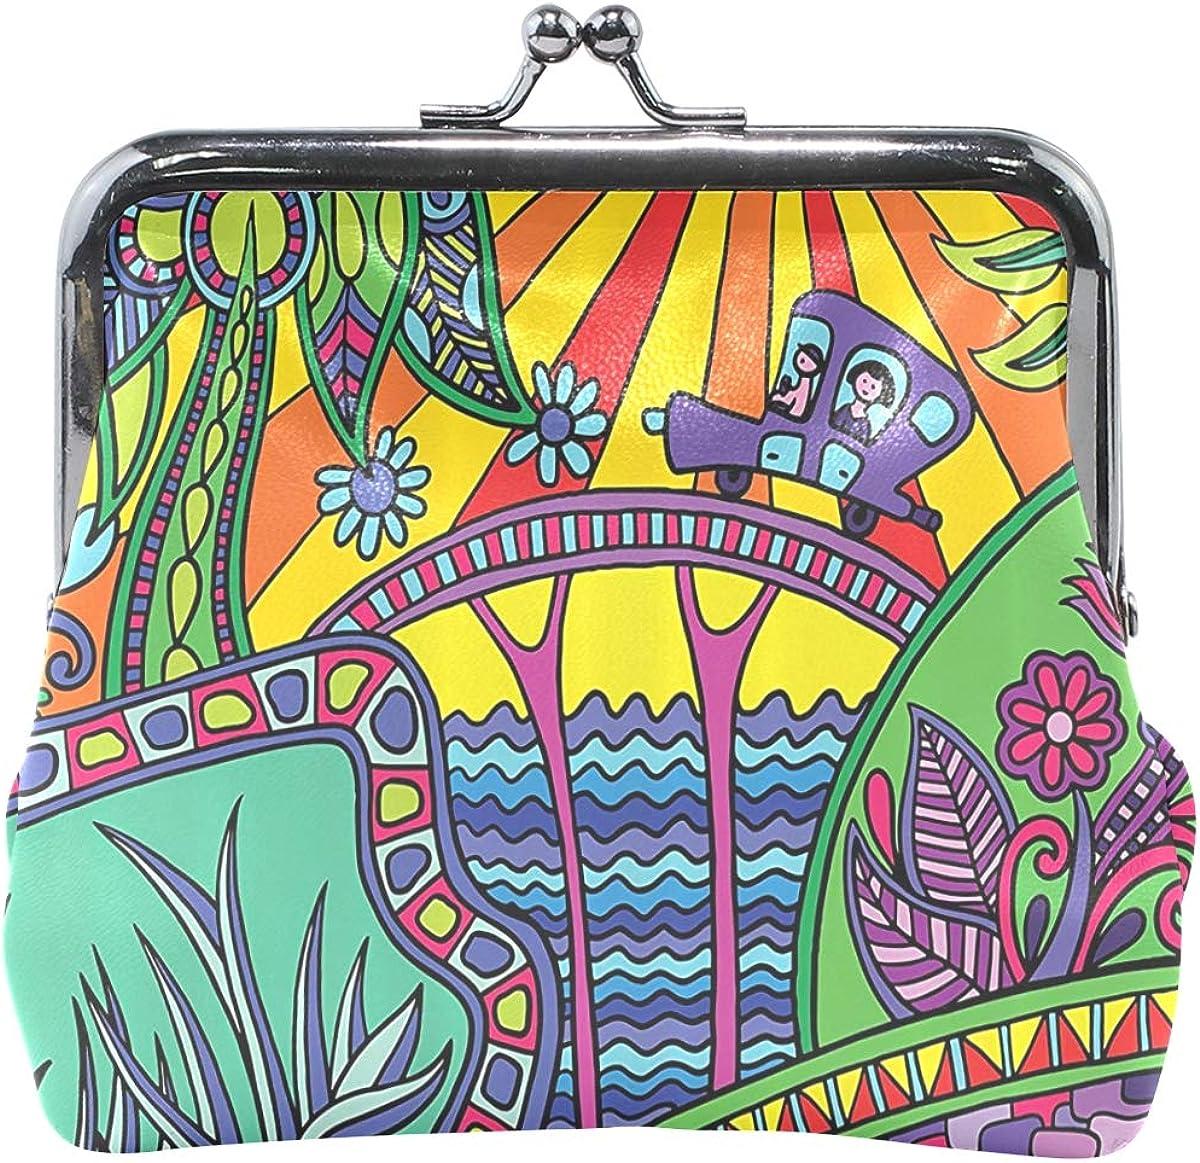 MALPLENA Colored Fictional Landscape change purse for women leather purse